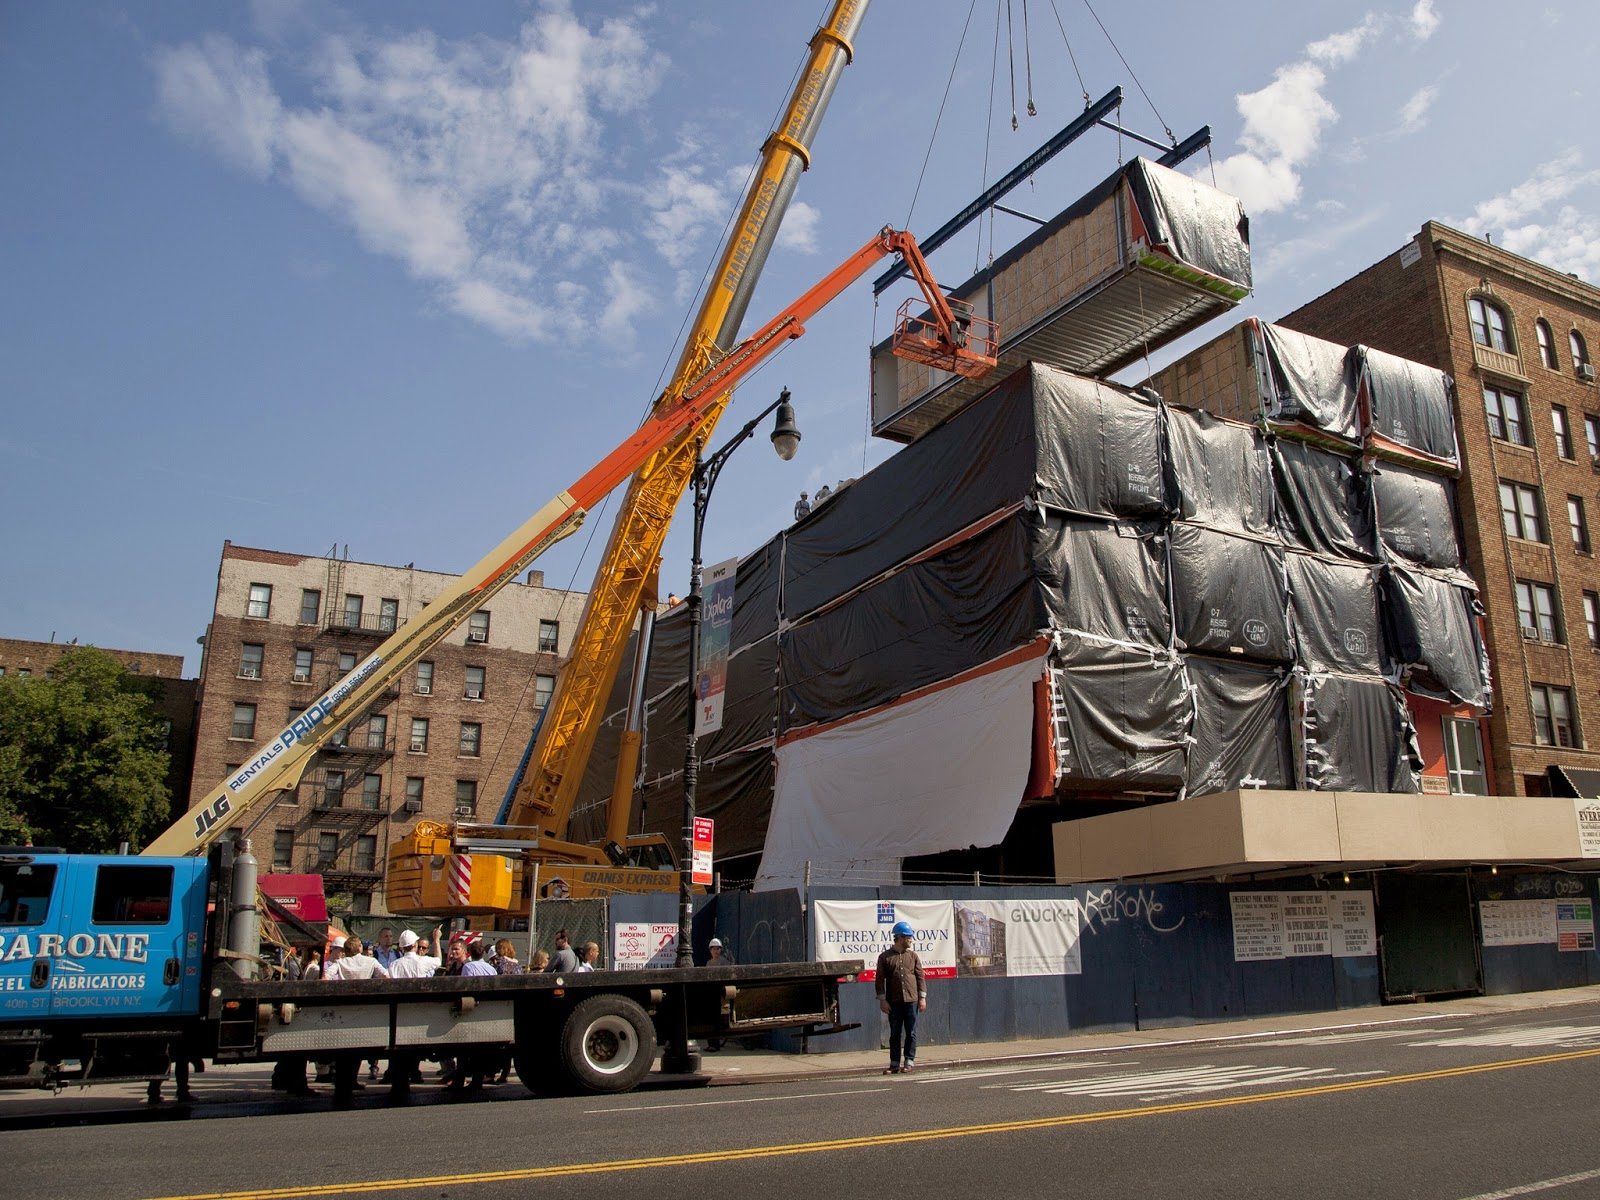 LEGOLAND modular construction deskilling and deunionization in